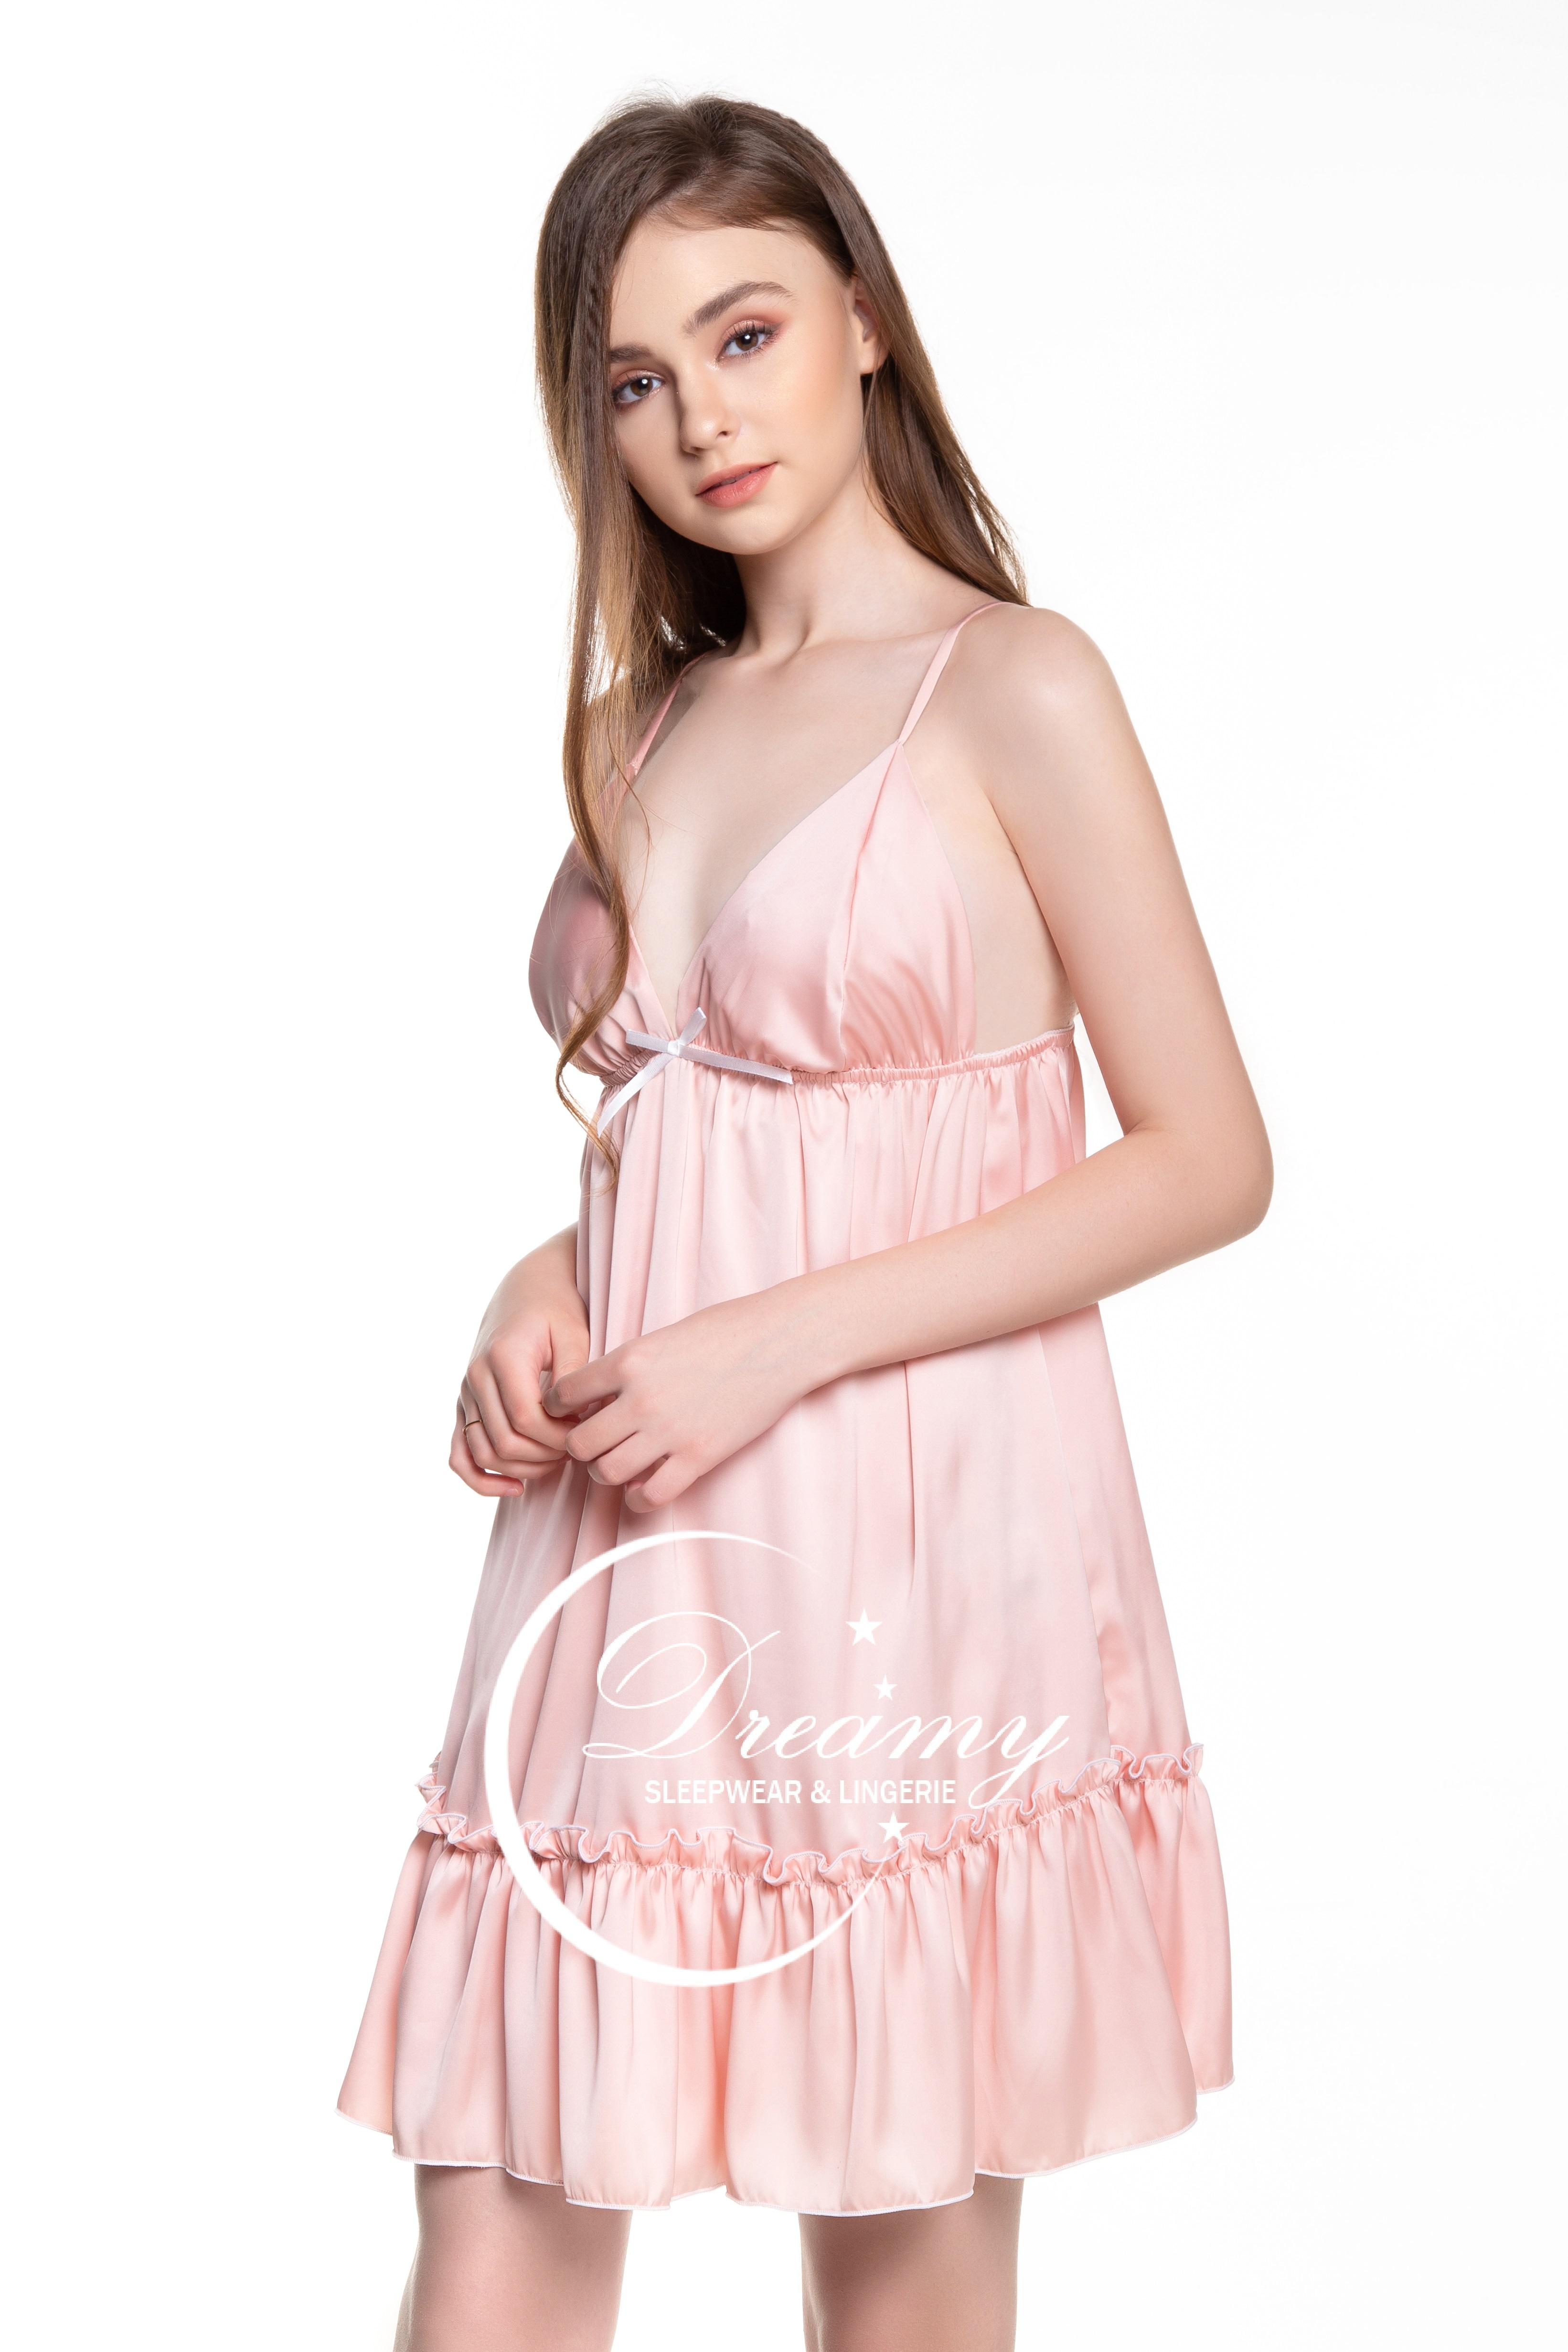 Dreamy - VX04 Váy ngủ lụa cao cấp hai dây nhúng bèo, Váy ngủ lụa cao cấp, váy ngủ nữ,...